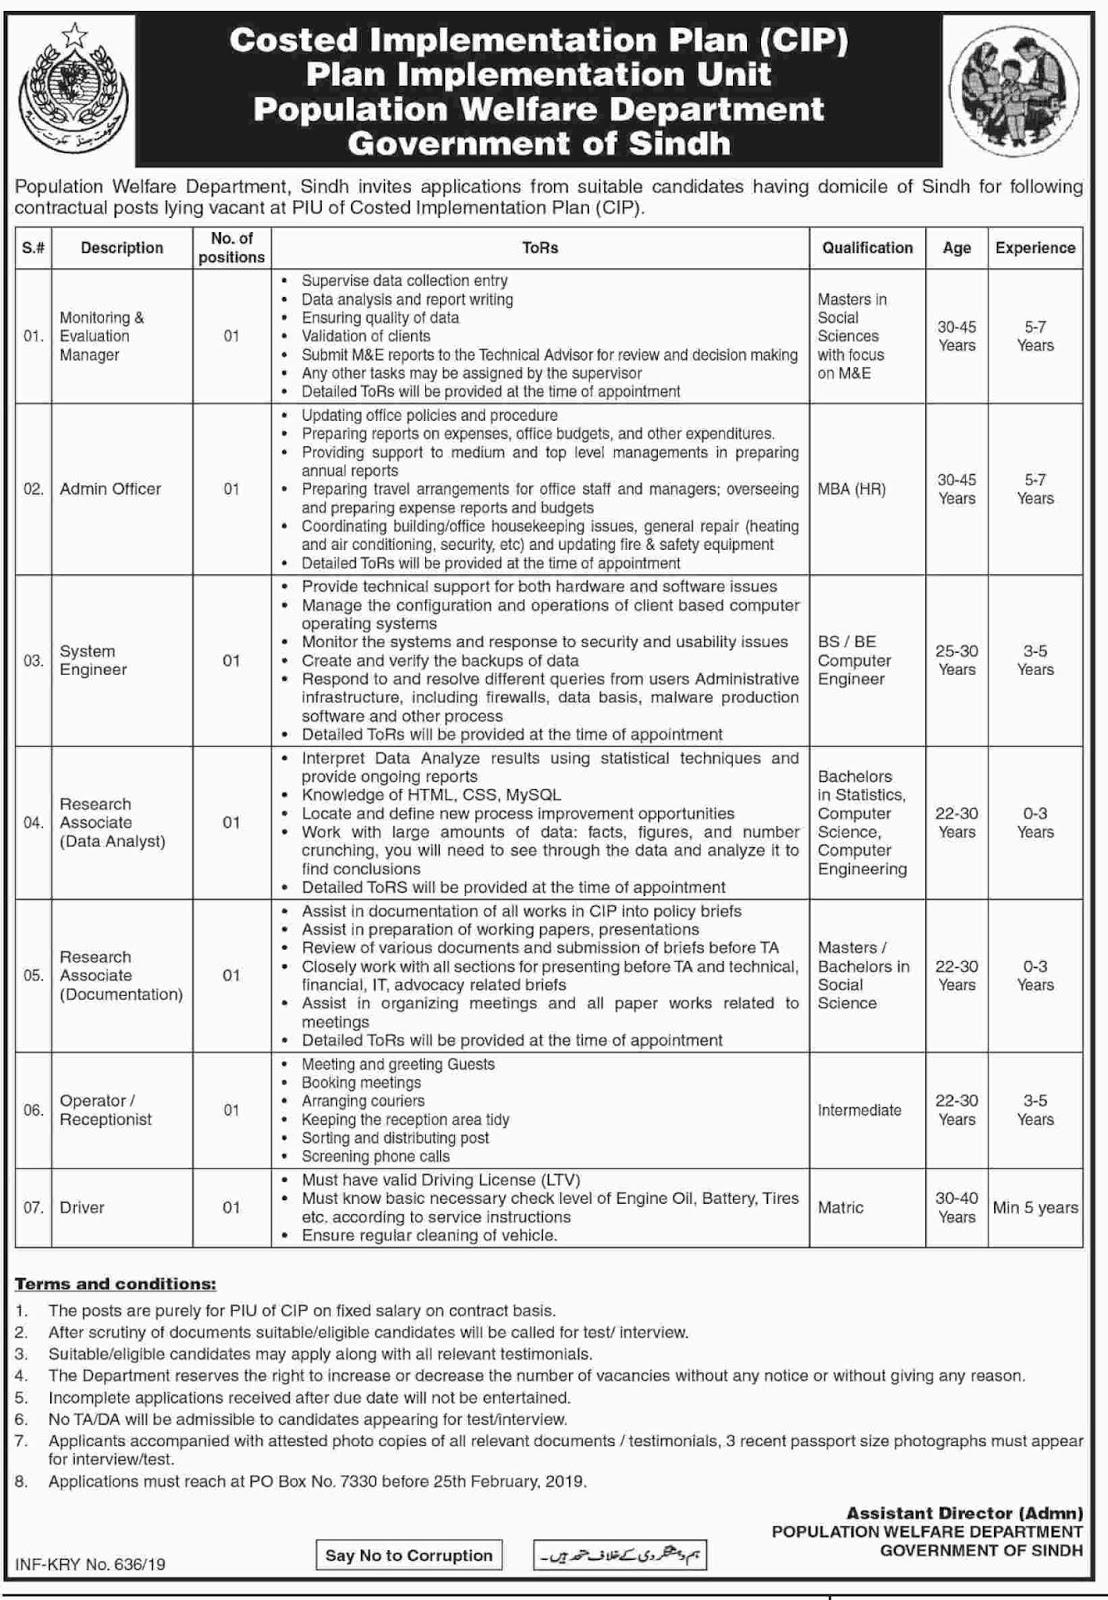 Costed Implementation Plan (CIP) Plan Implementation Unit Population Welfare Department Government of Sindh at Costed Implementation Plan